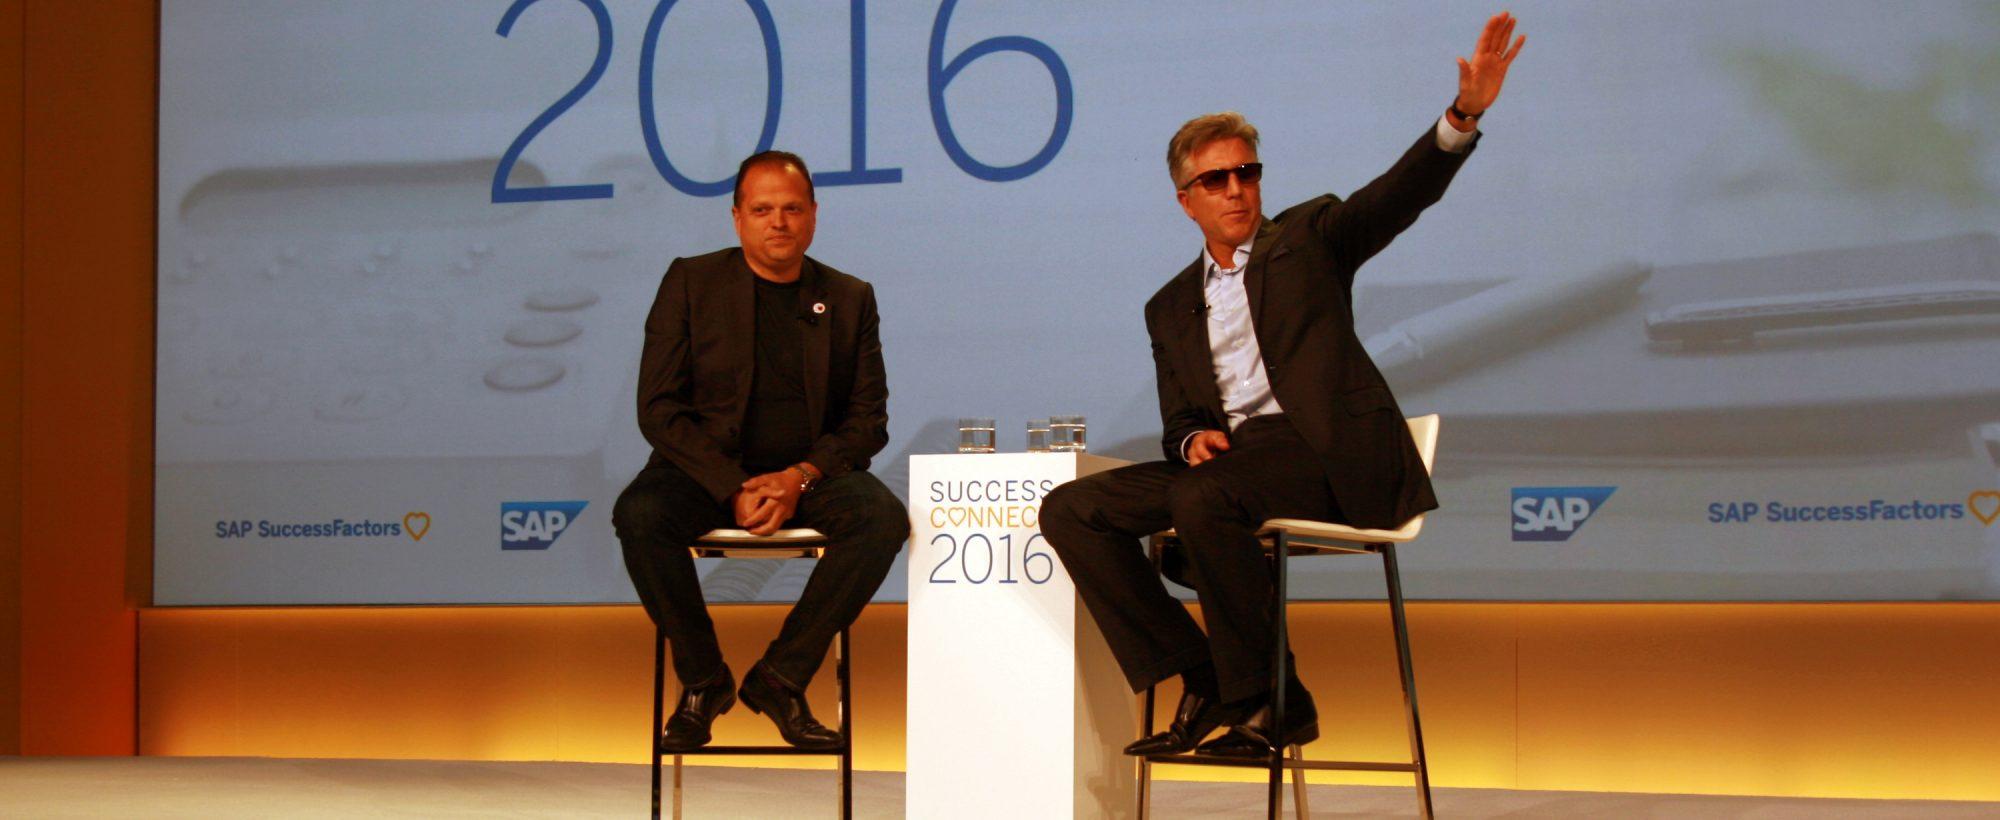 SAP Slideshow 10a - McDermott Keynote